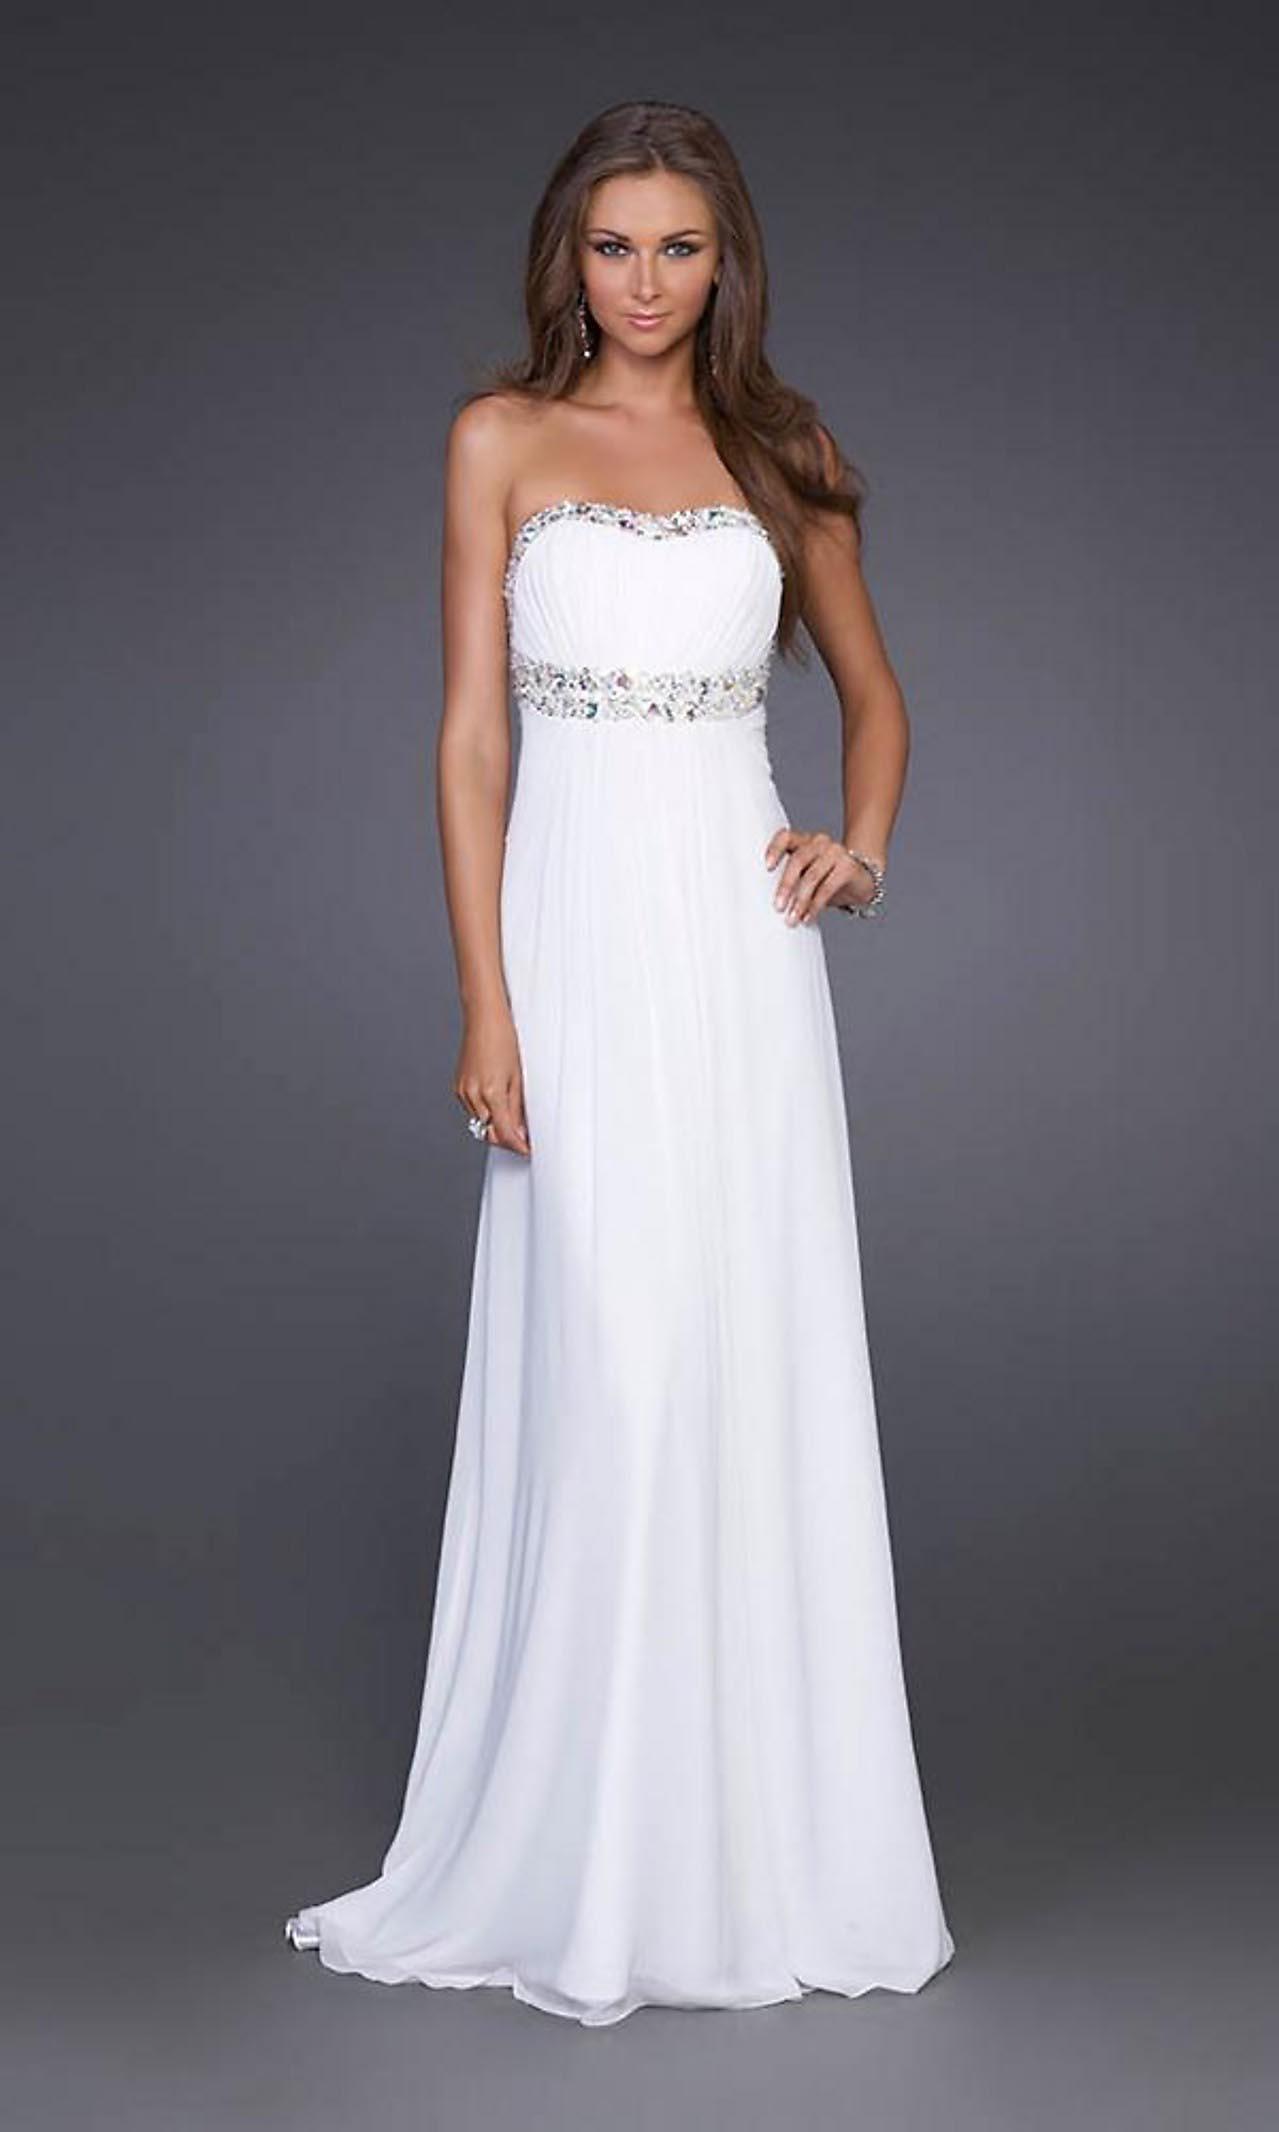 Simple White Prom Dress